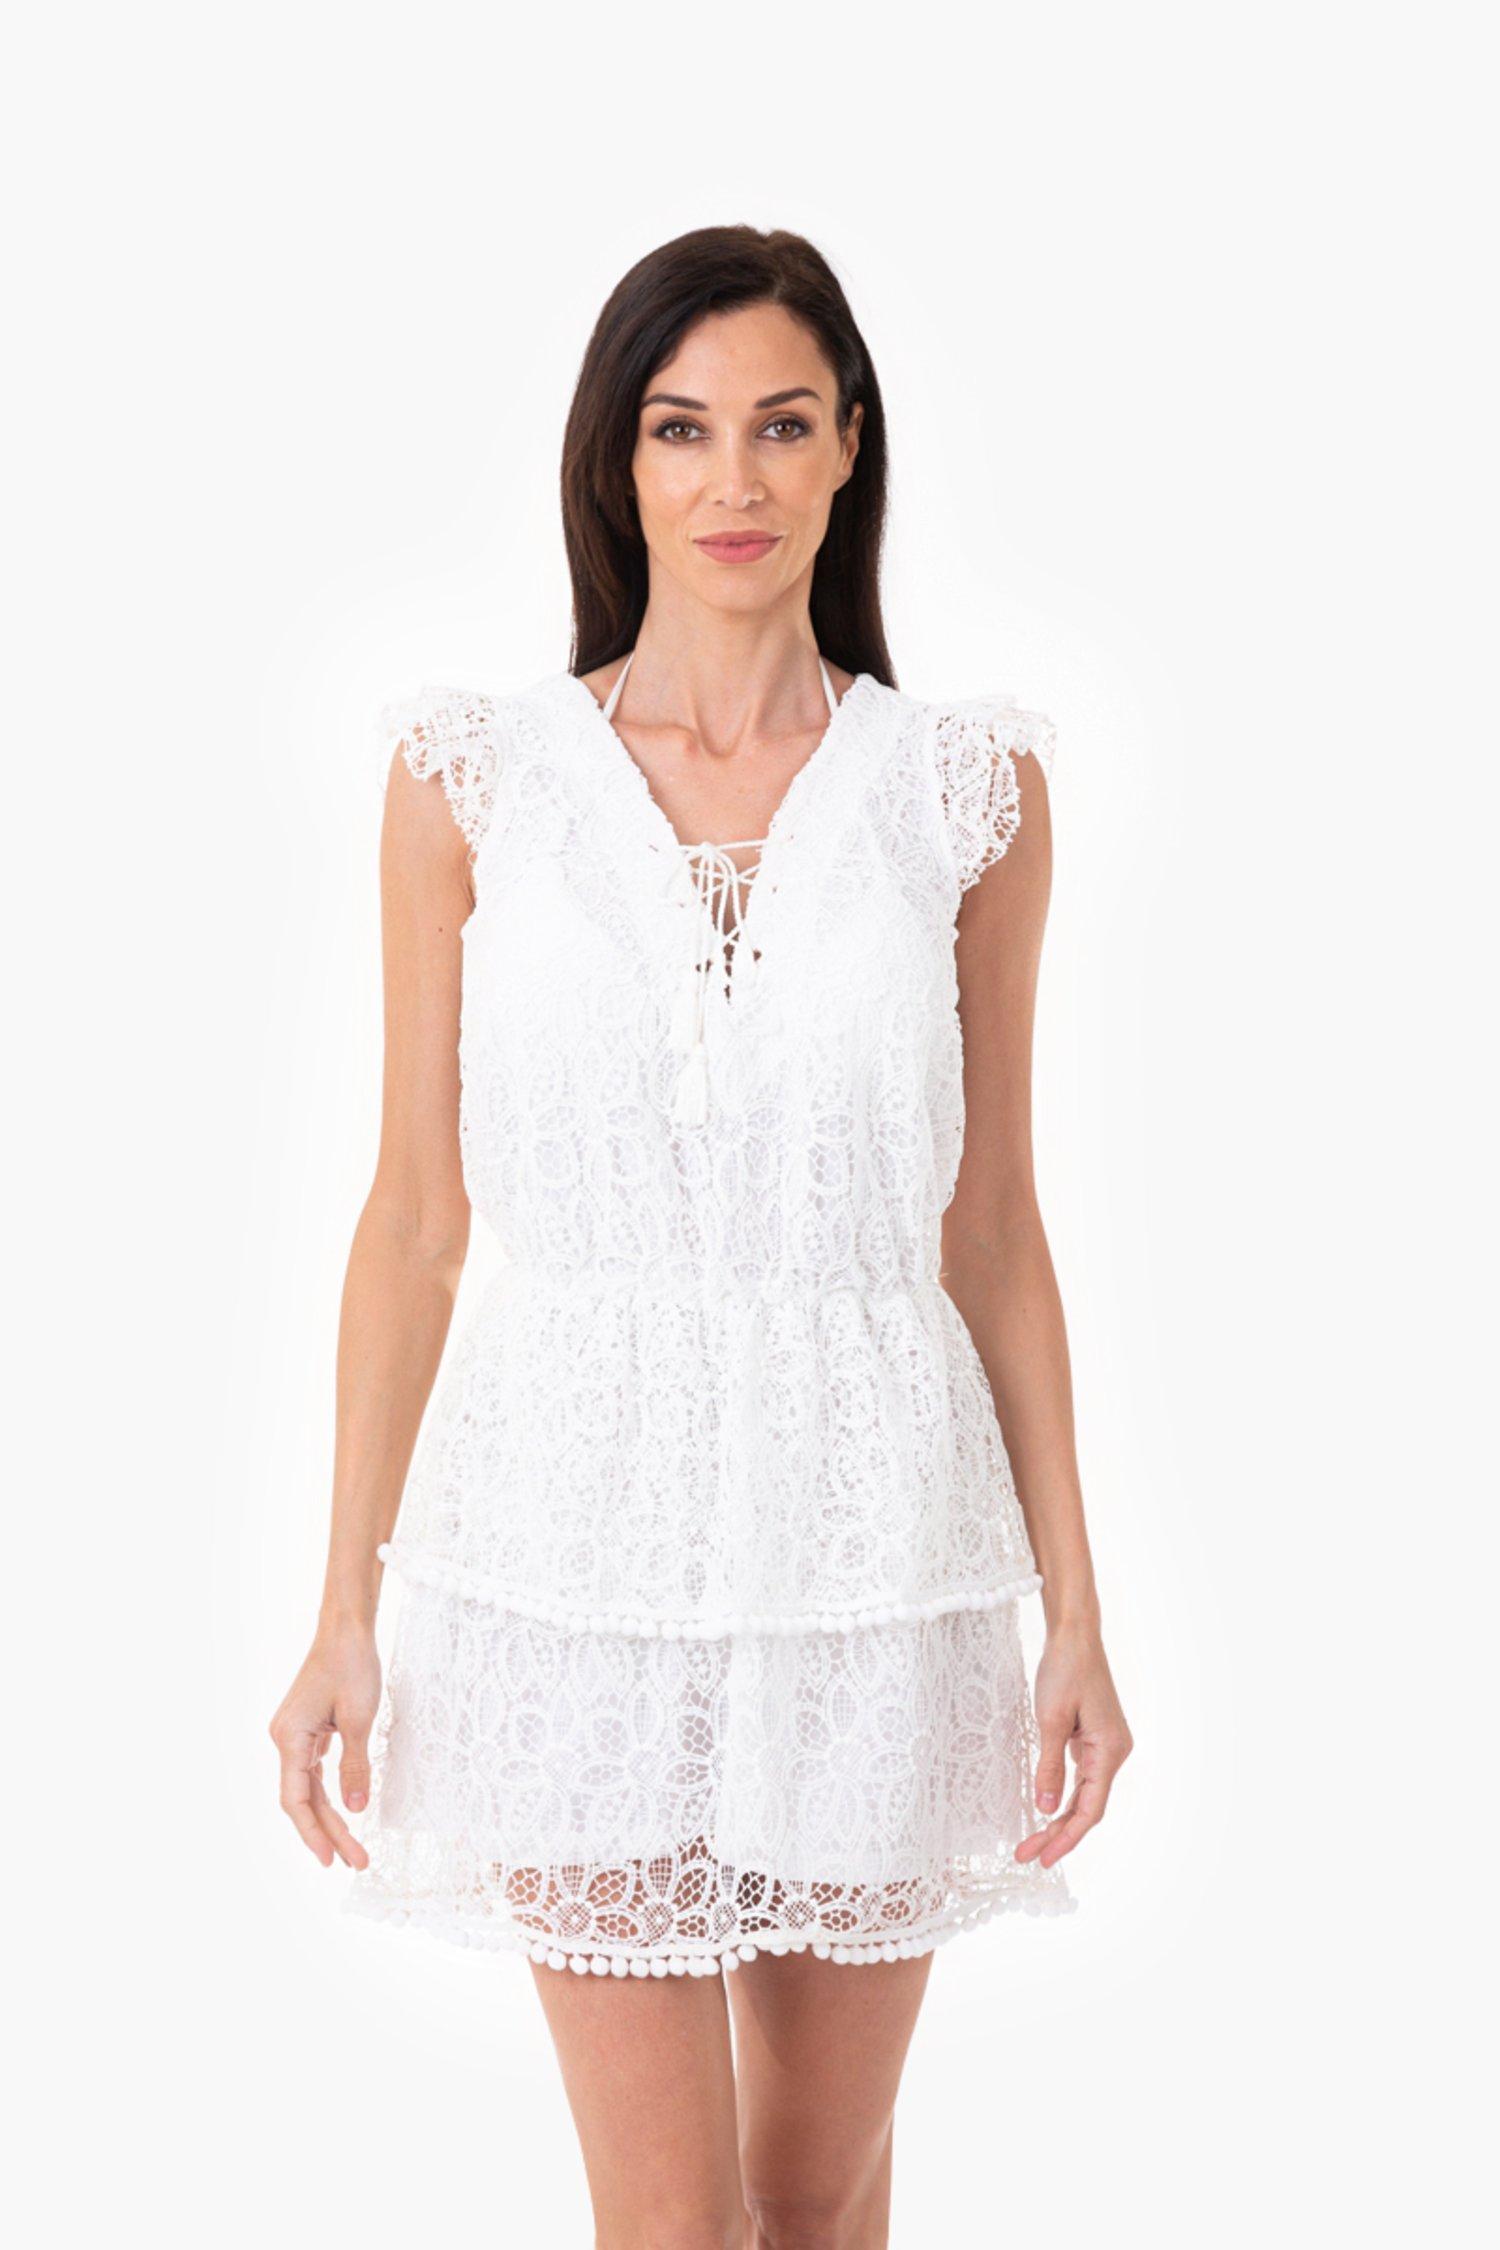 MACRAME' LACE SHORT DRESS - Pizzo Macrame' Bianco